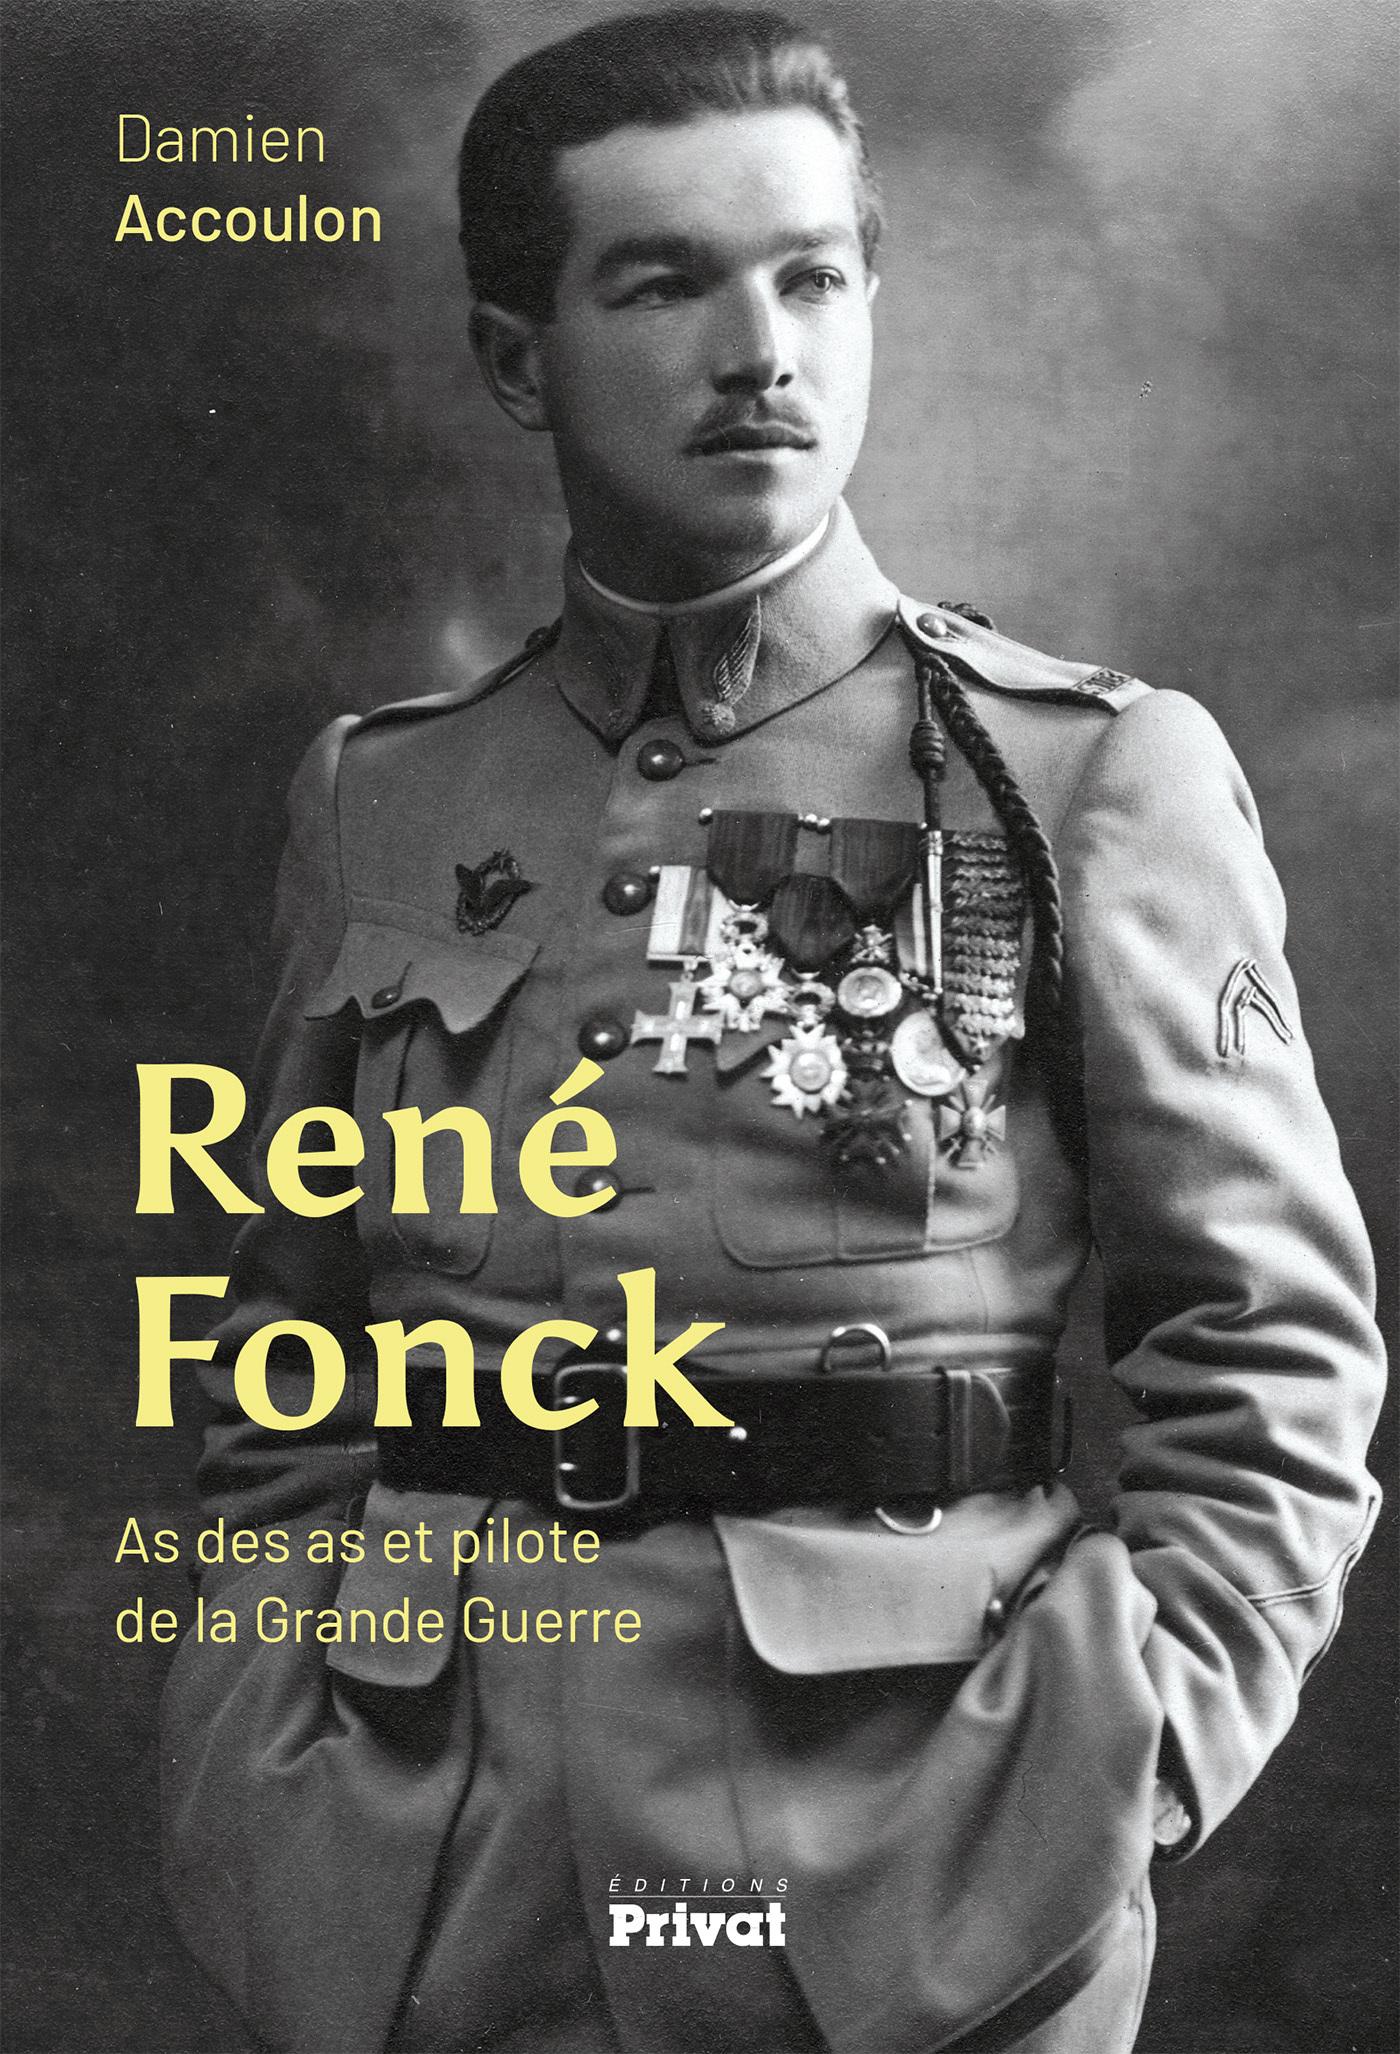 RENE FONCK,